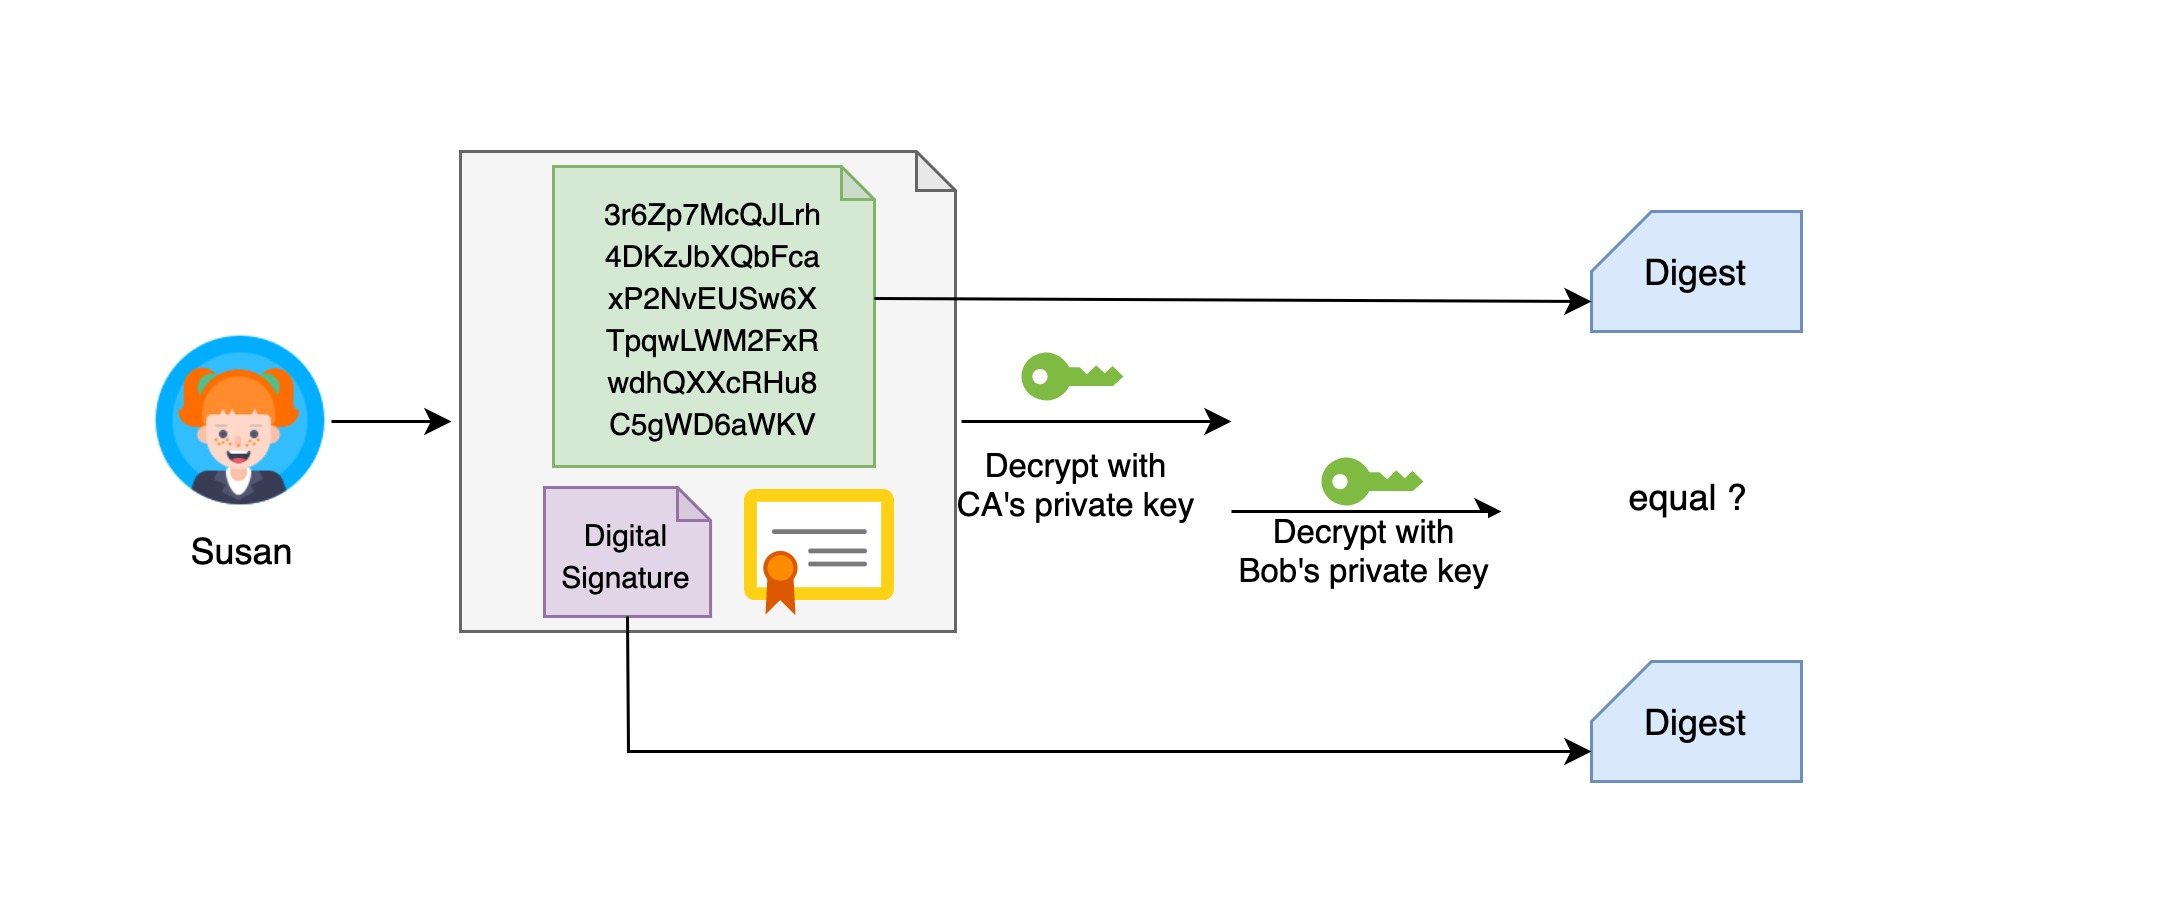 digital-signature-validation-with-ca.jpg